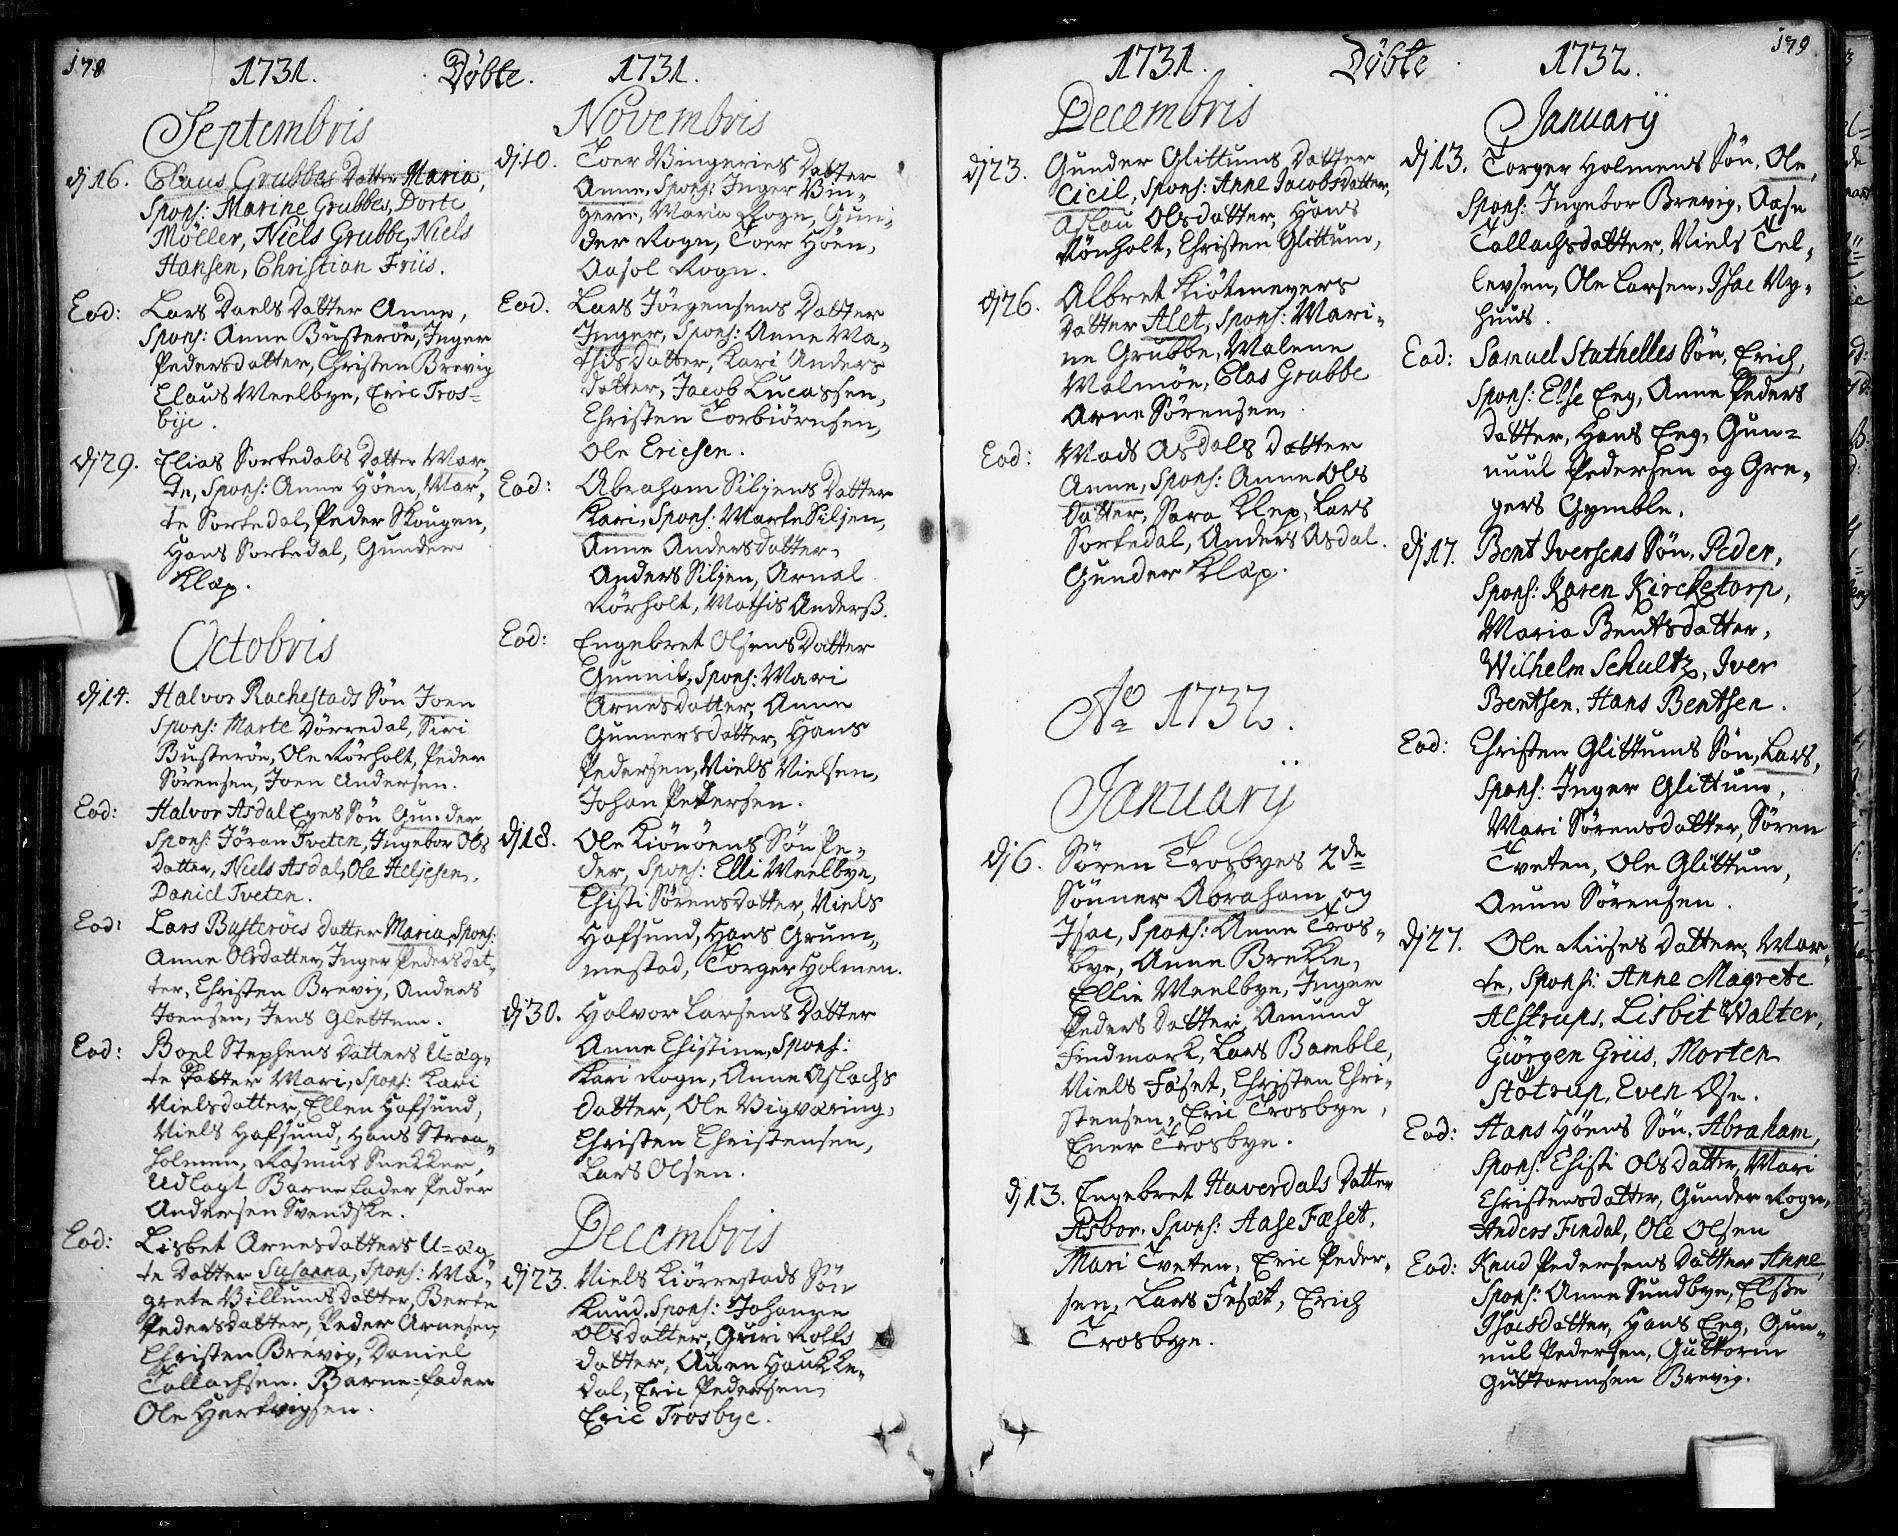 SAKO, Bamble kirkebøker, F/Fa/L0001: Ministerialbok nr. I 1, 1702-1774, s. 178-179